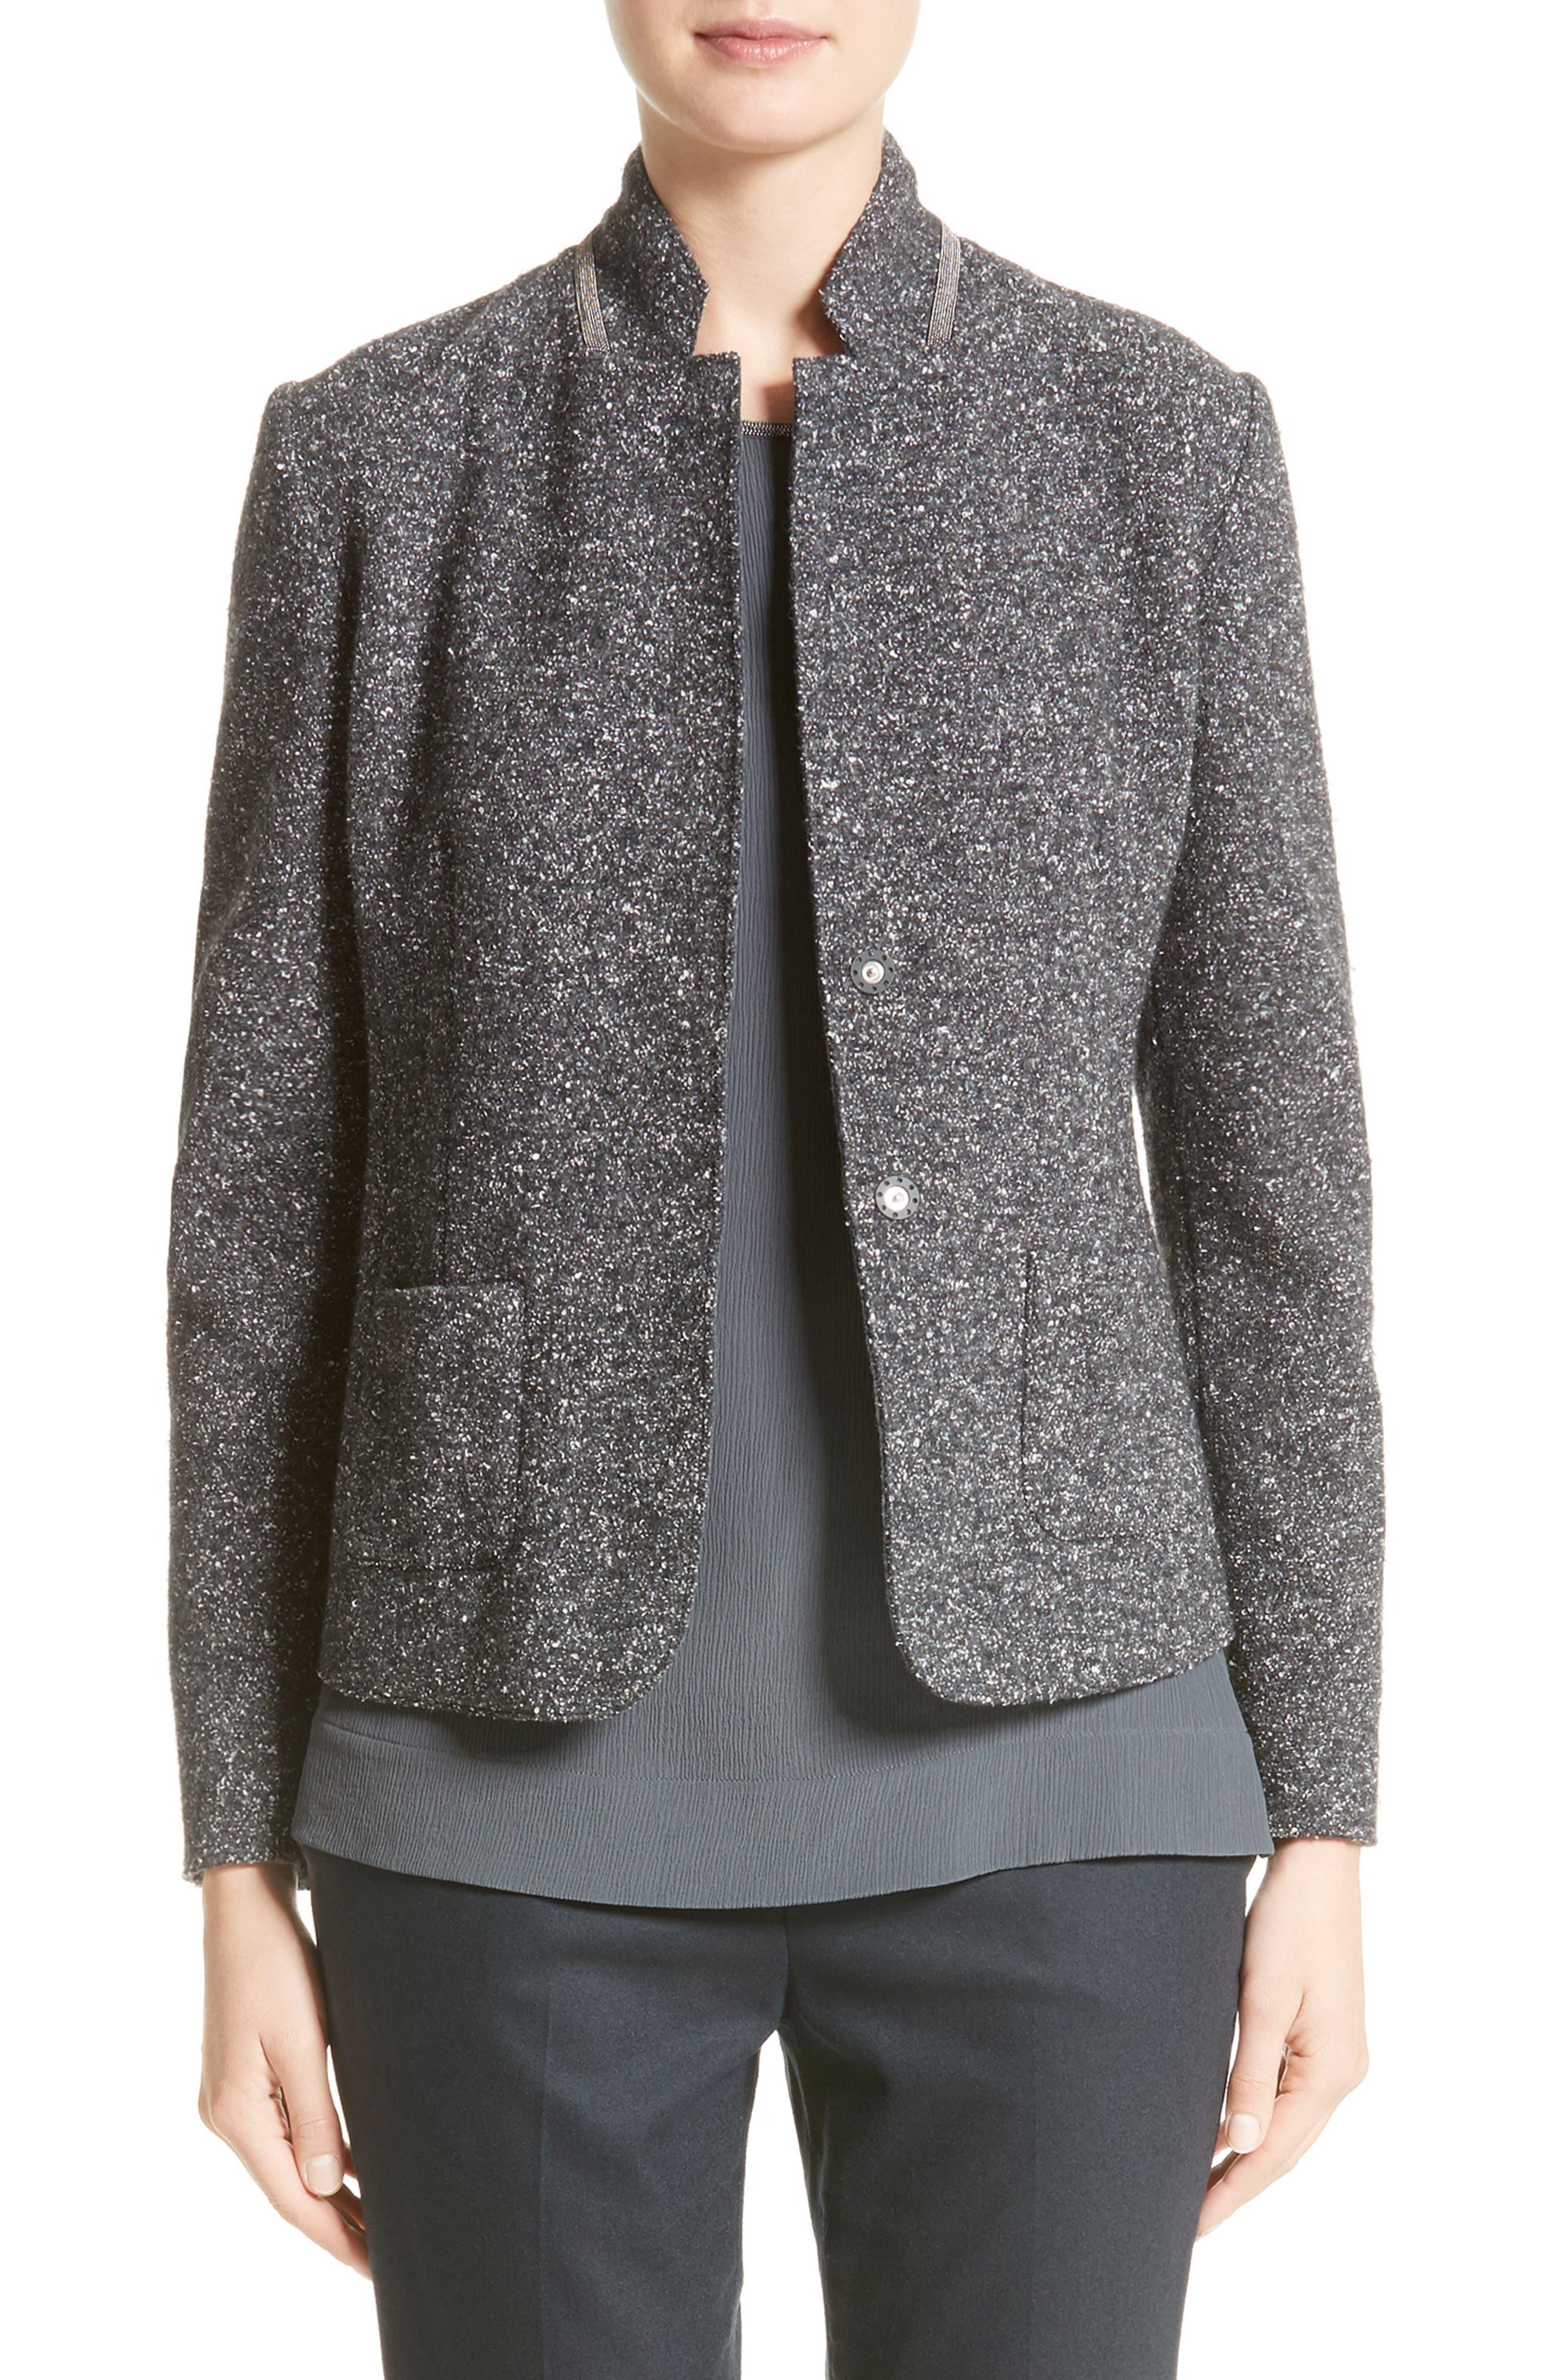 Pebble Tweed Knit Jacket,                             Main thumbnail 1, color,                             Grey Multi